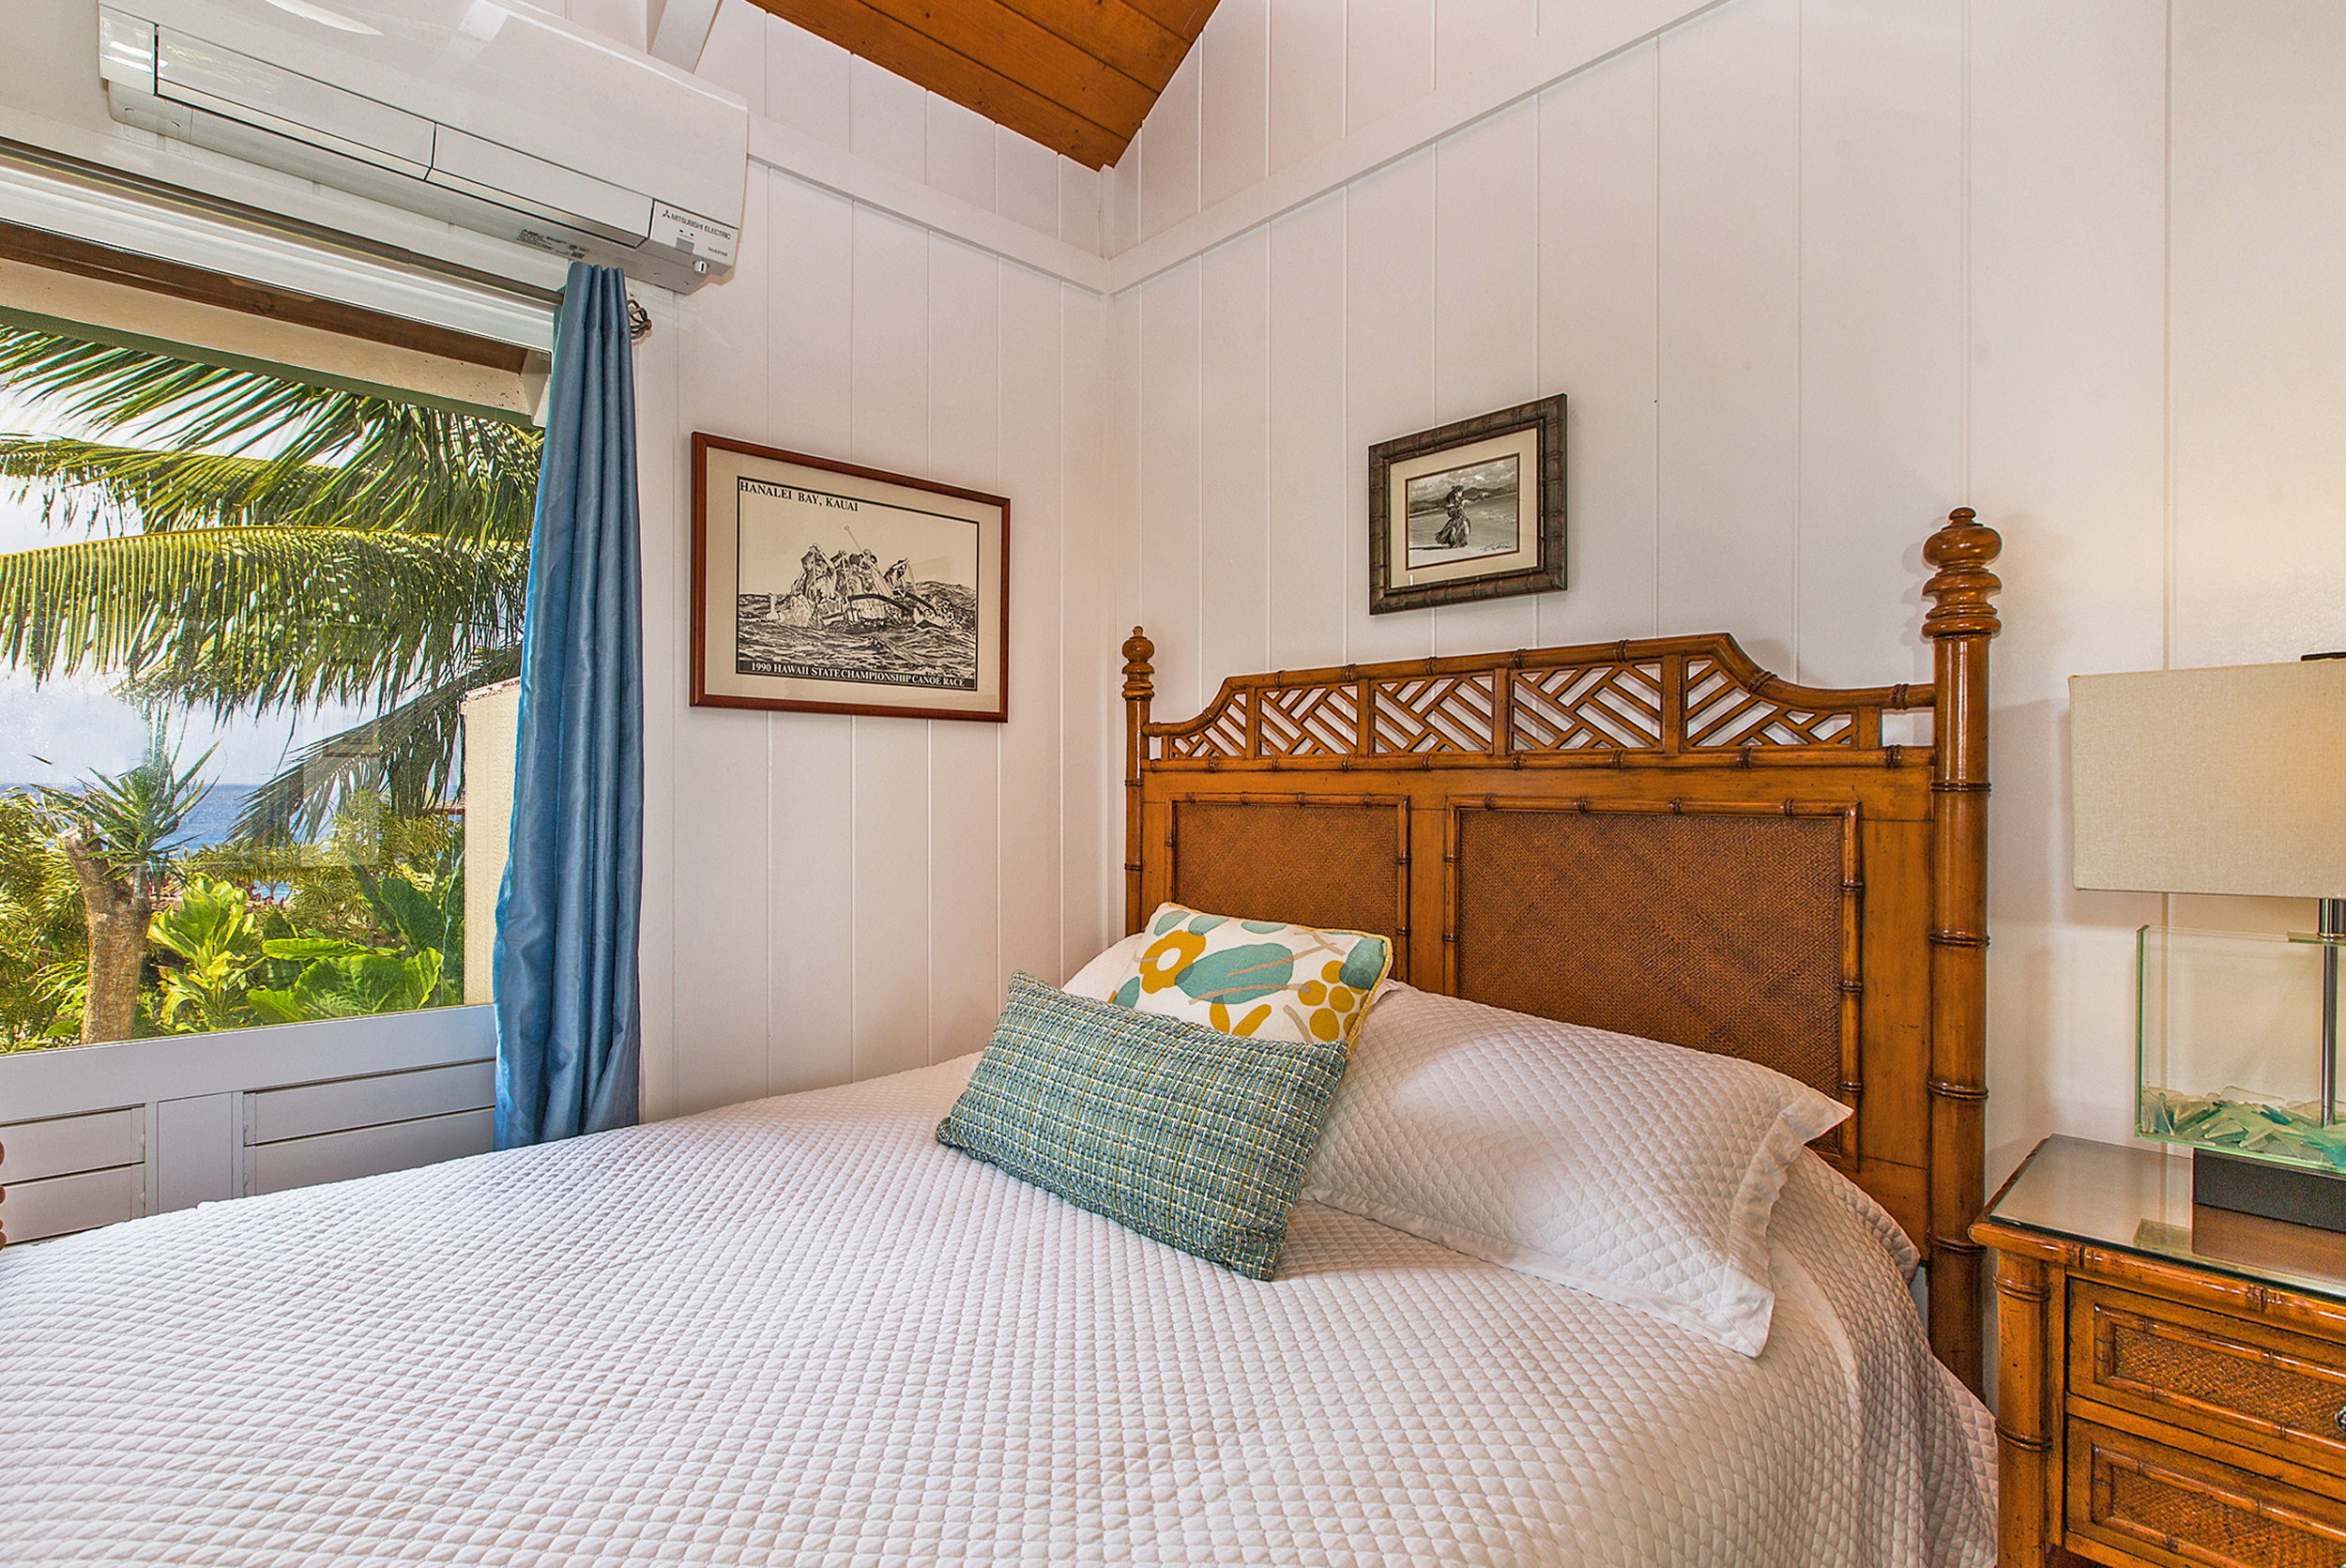 3rd-Bedroom-1.jpg_high_2194195.jpg